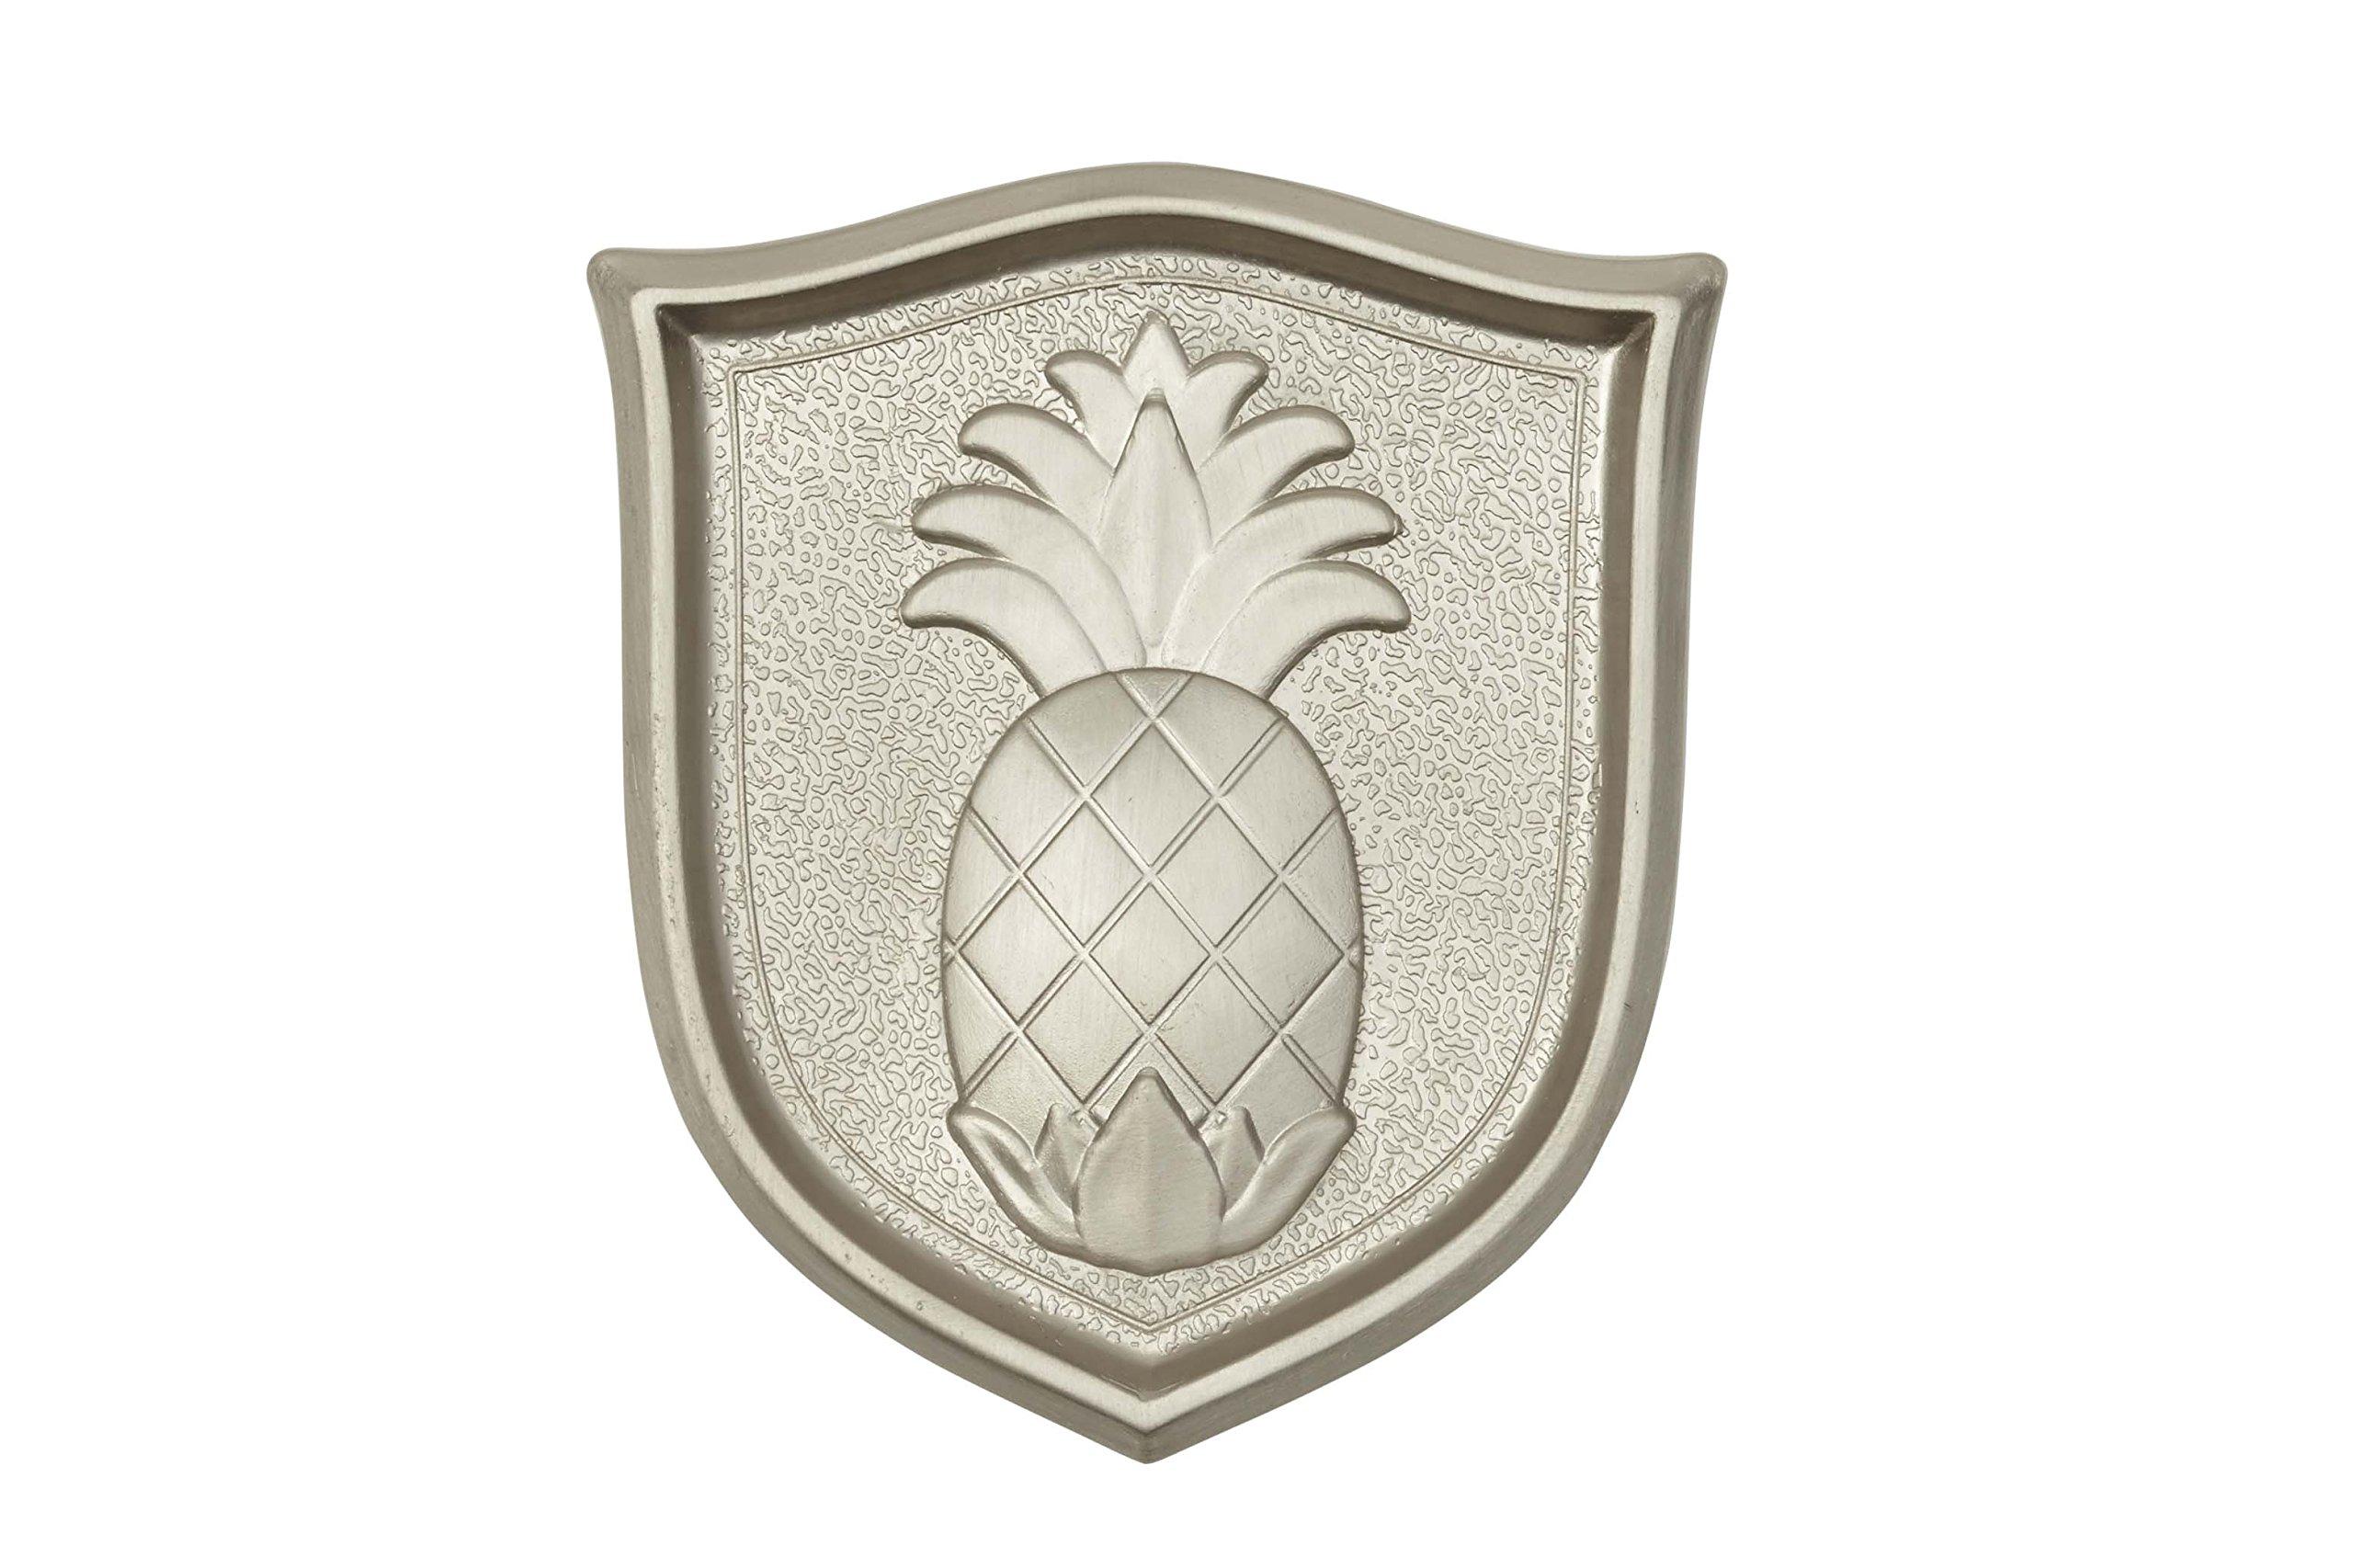 Architectural Mailboxes 3630SN Aluminum Satin Nickel Pineapple Emblem